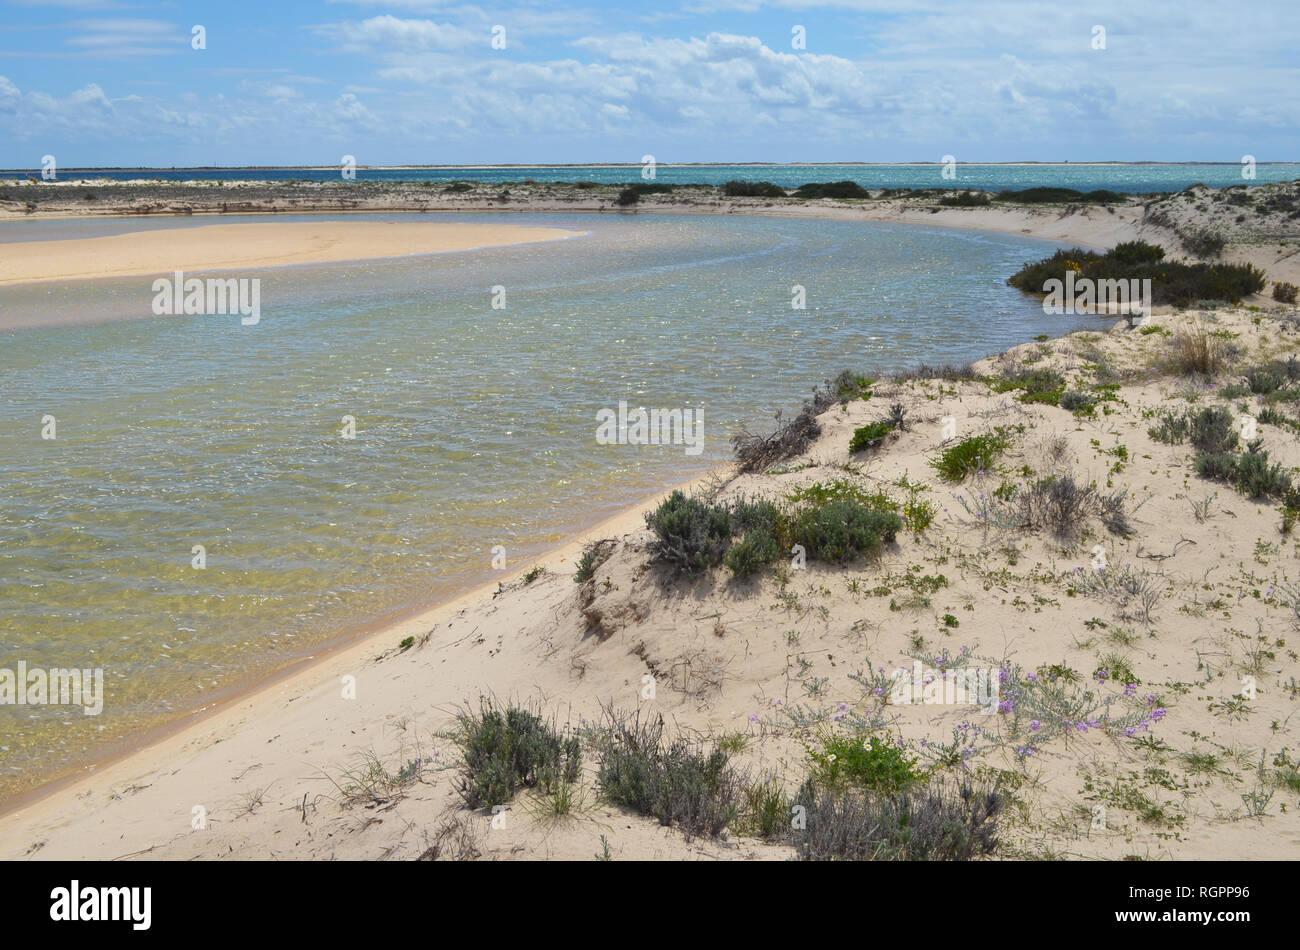 Coastal lagoon in Armona island, part of the Ria Formosa Natural Park in the Algarve region of southwestern Portugal - Stock Image